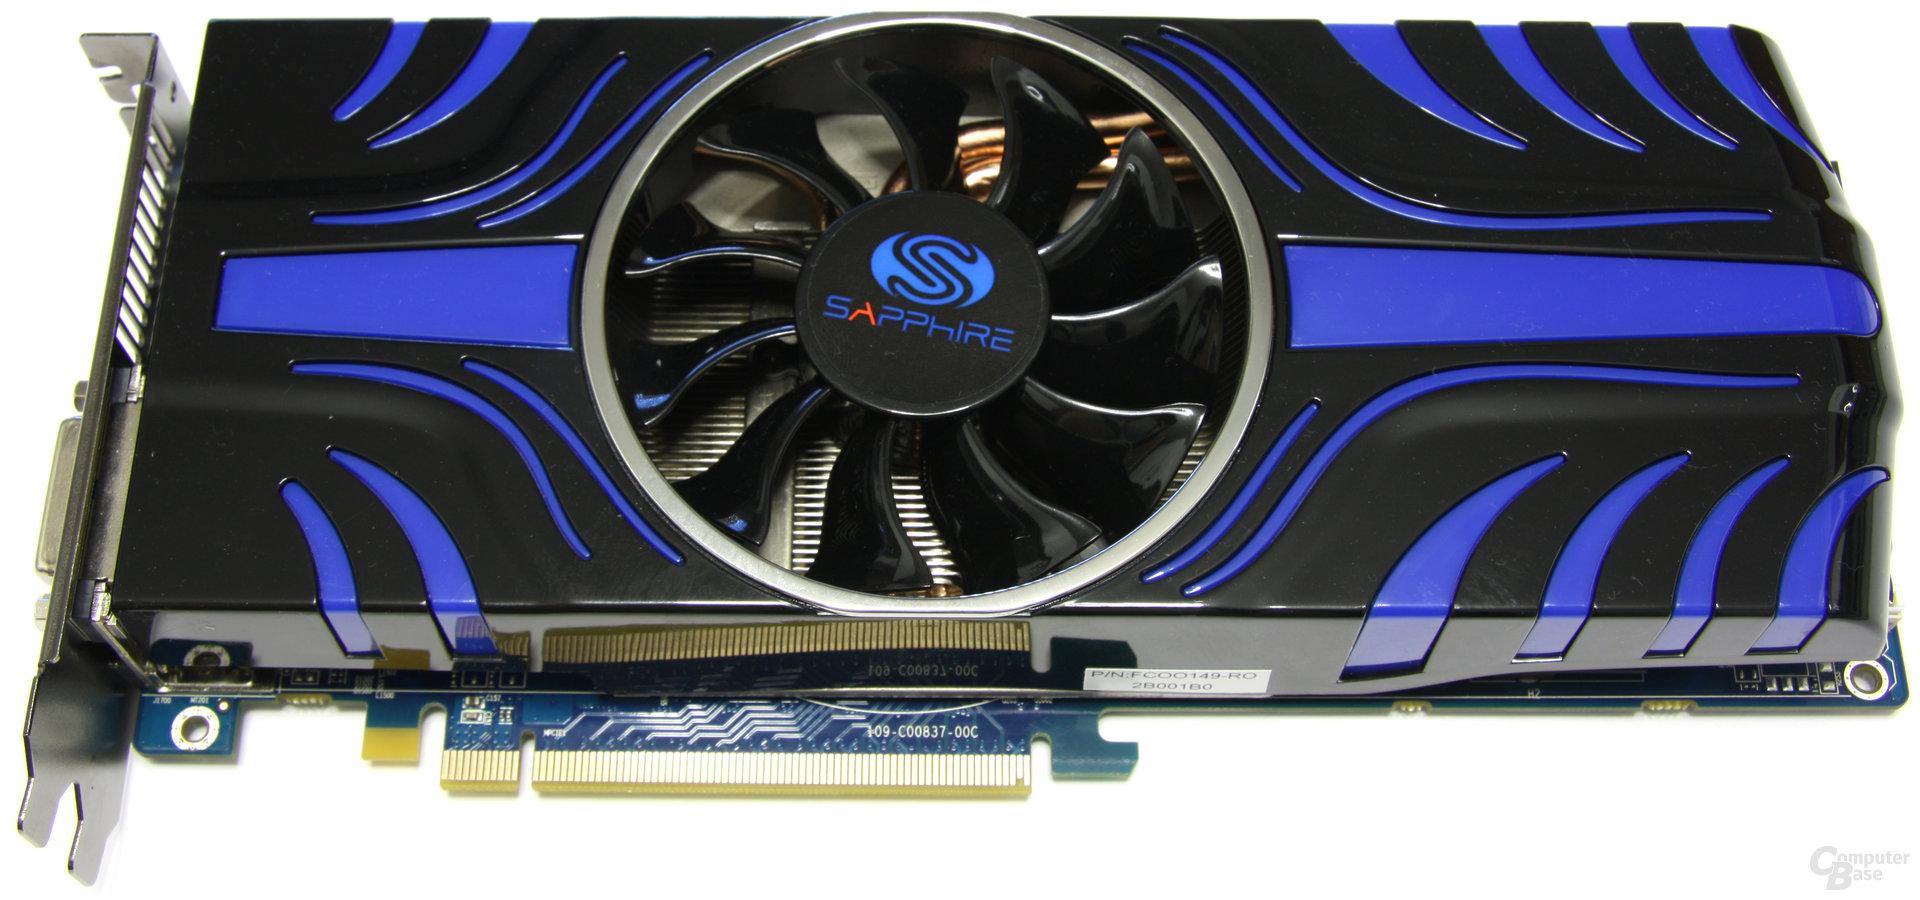 Sapphire Radeon HD 5850 Toxic